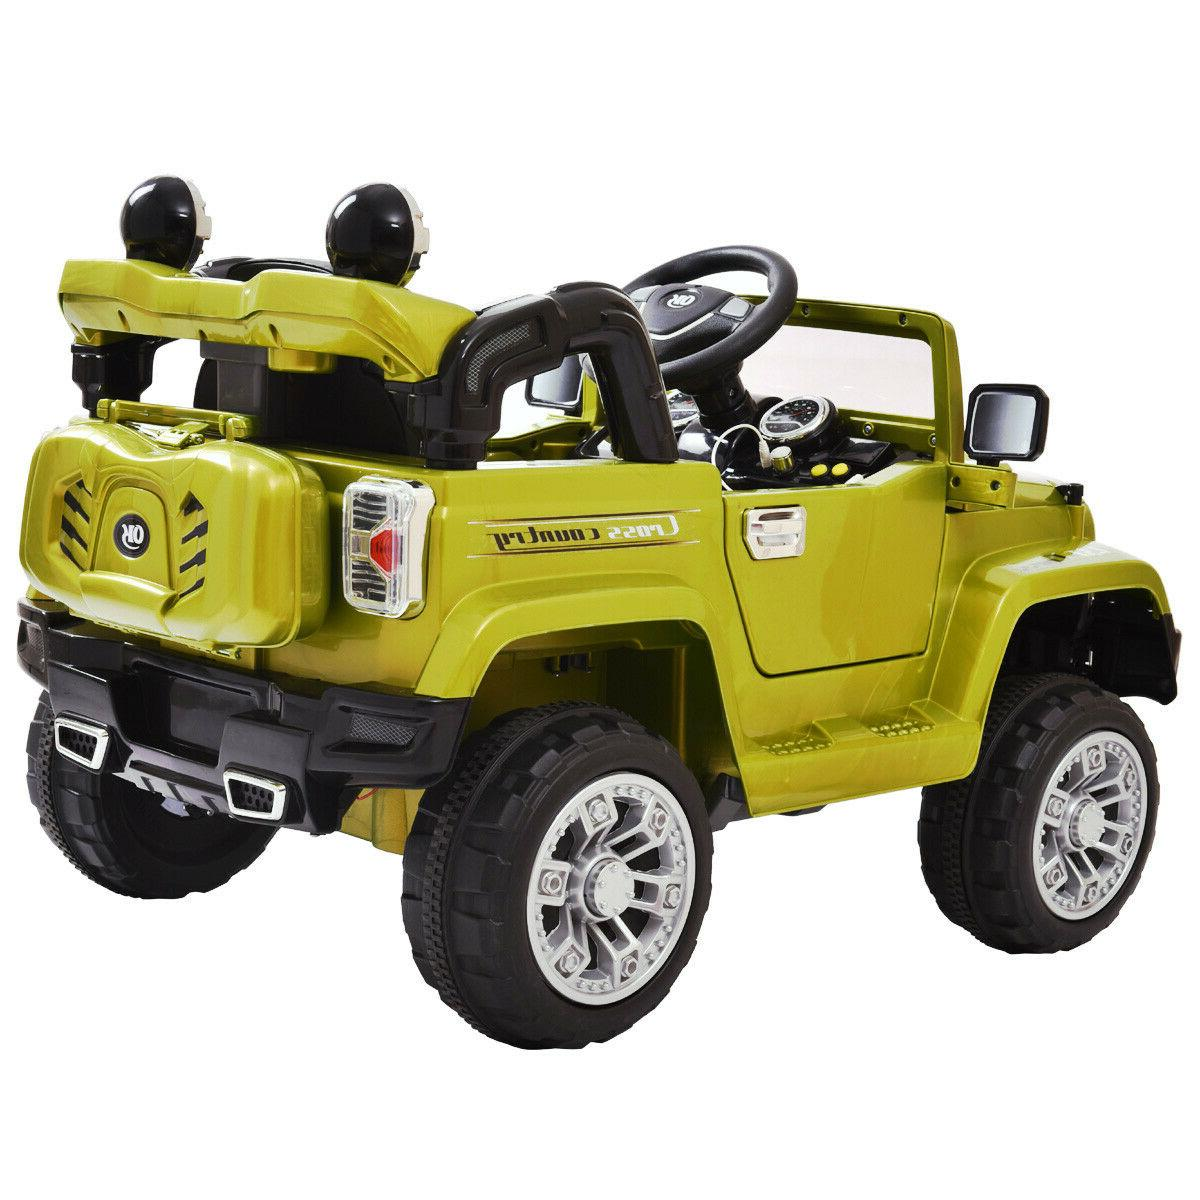 12V Power Wheels Car Truck Kids W/ Green